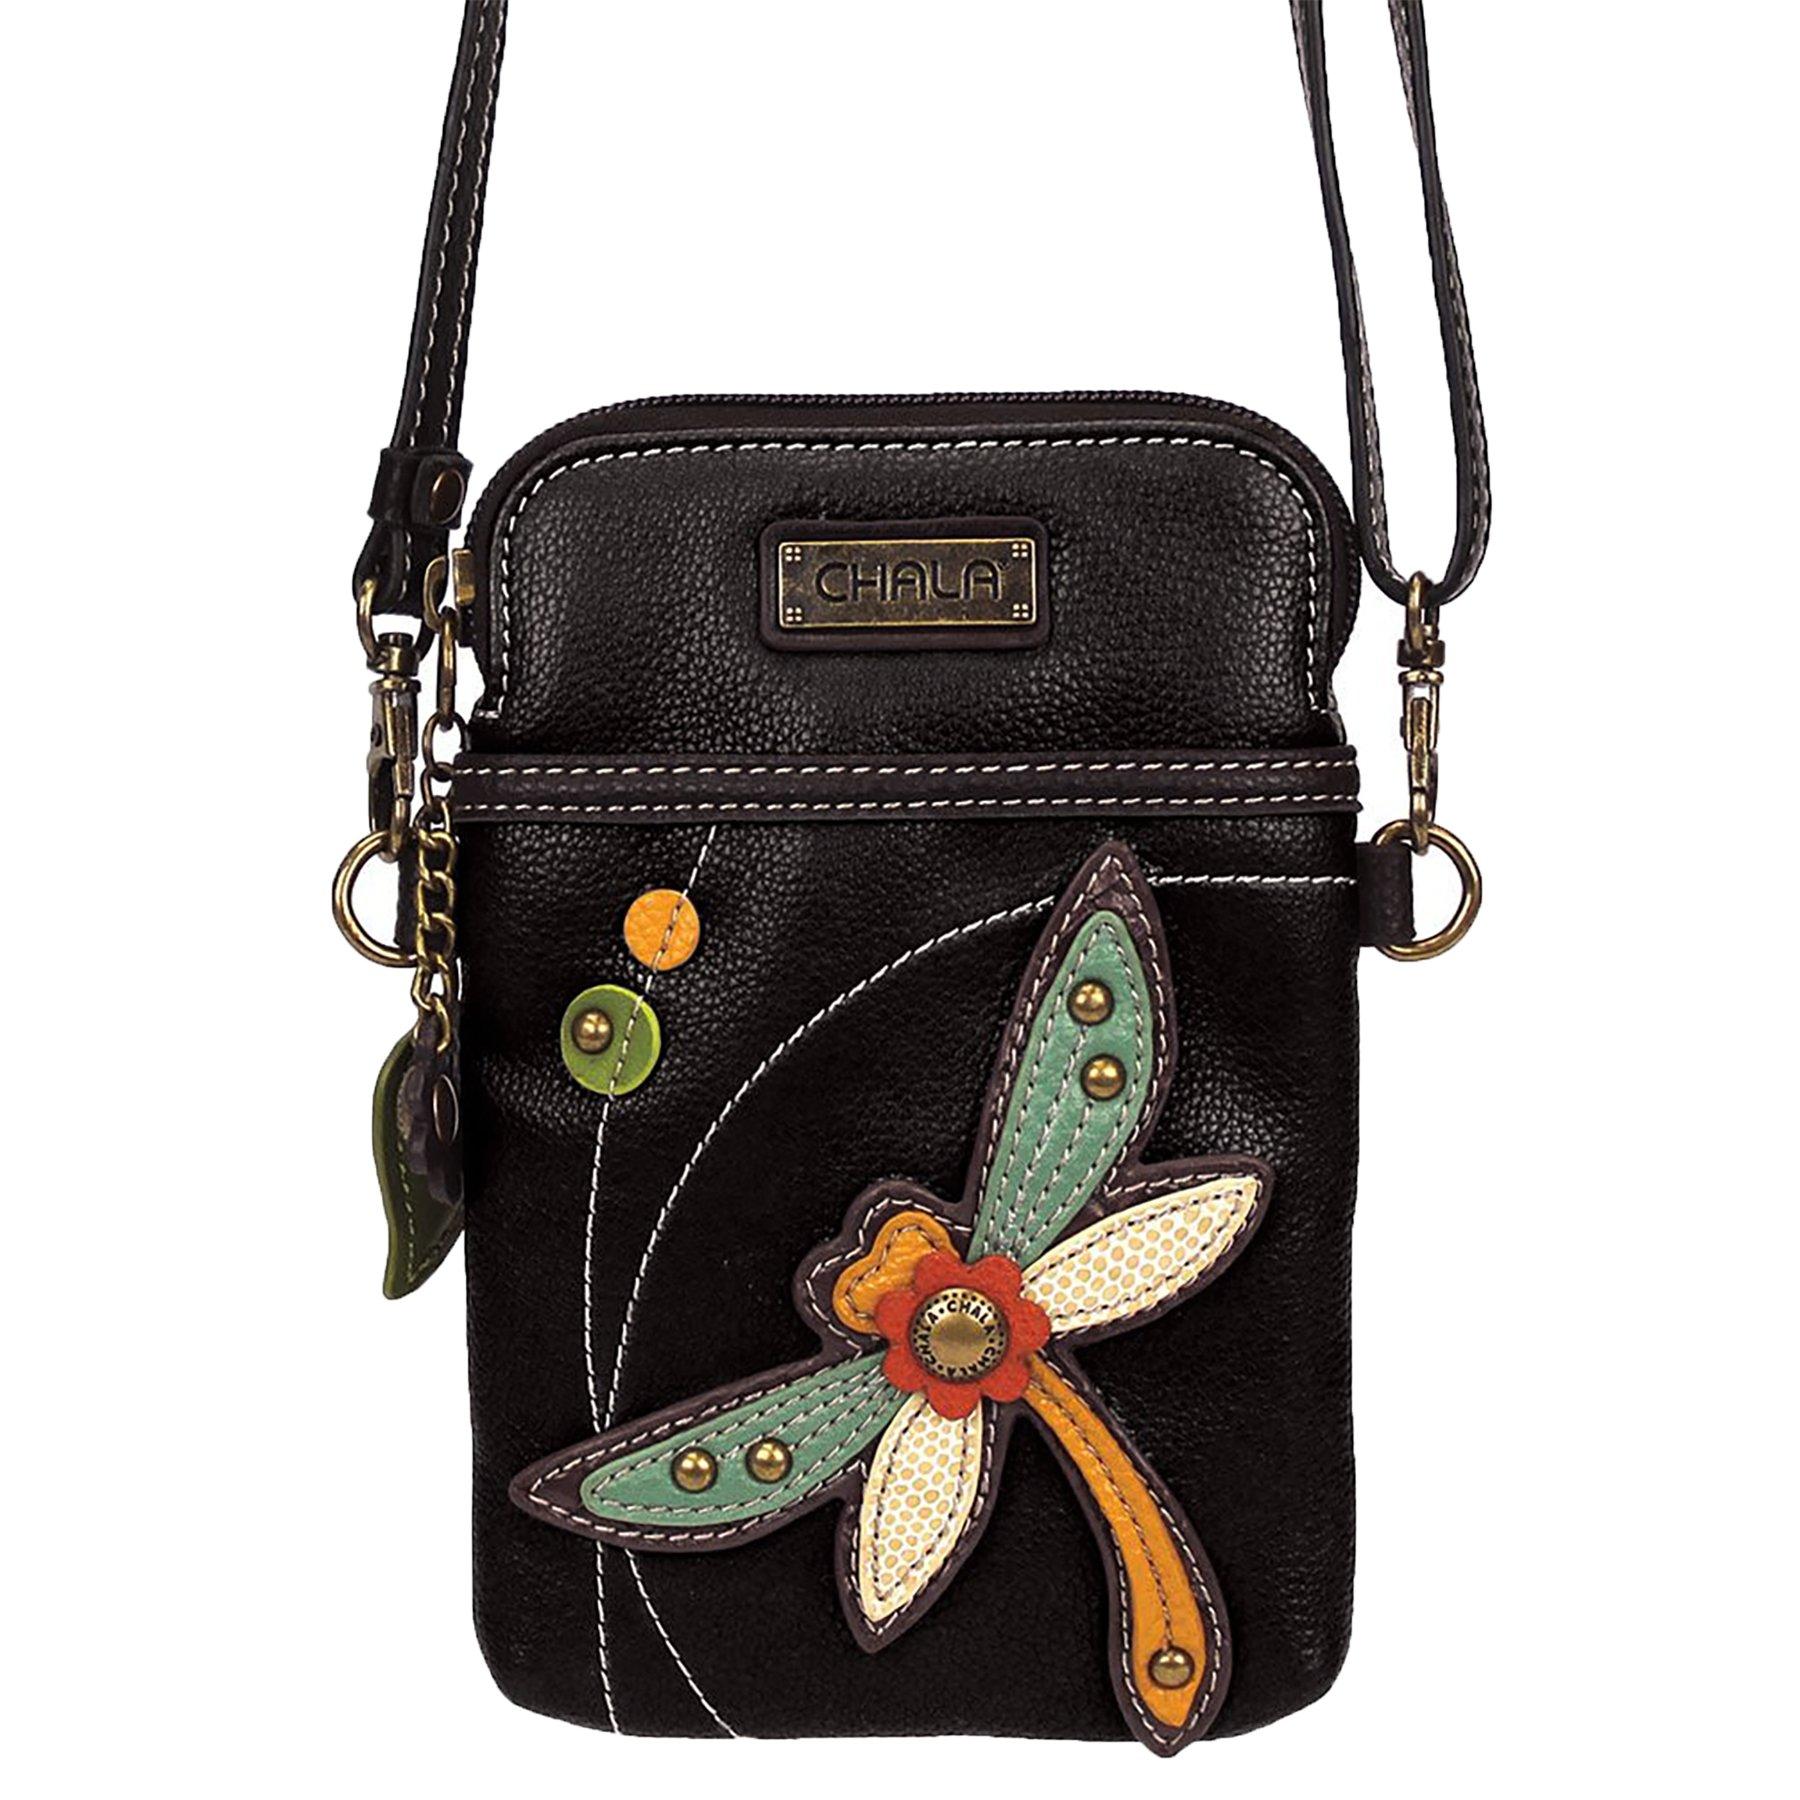 Chala Crossbody Cell Phone Purse - Women PU Leather Multicolor Handbag with  Adjustable Strap d28a6621b7